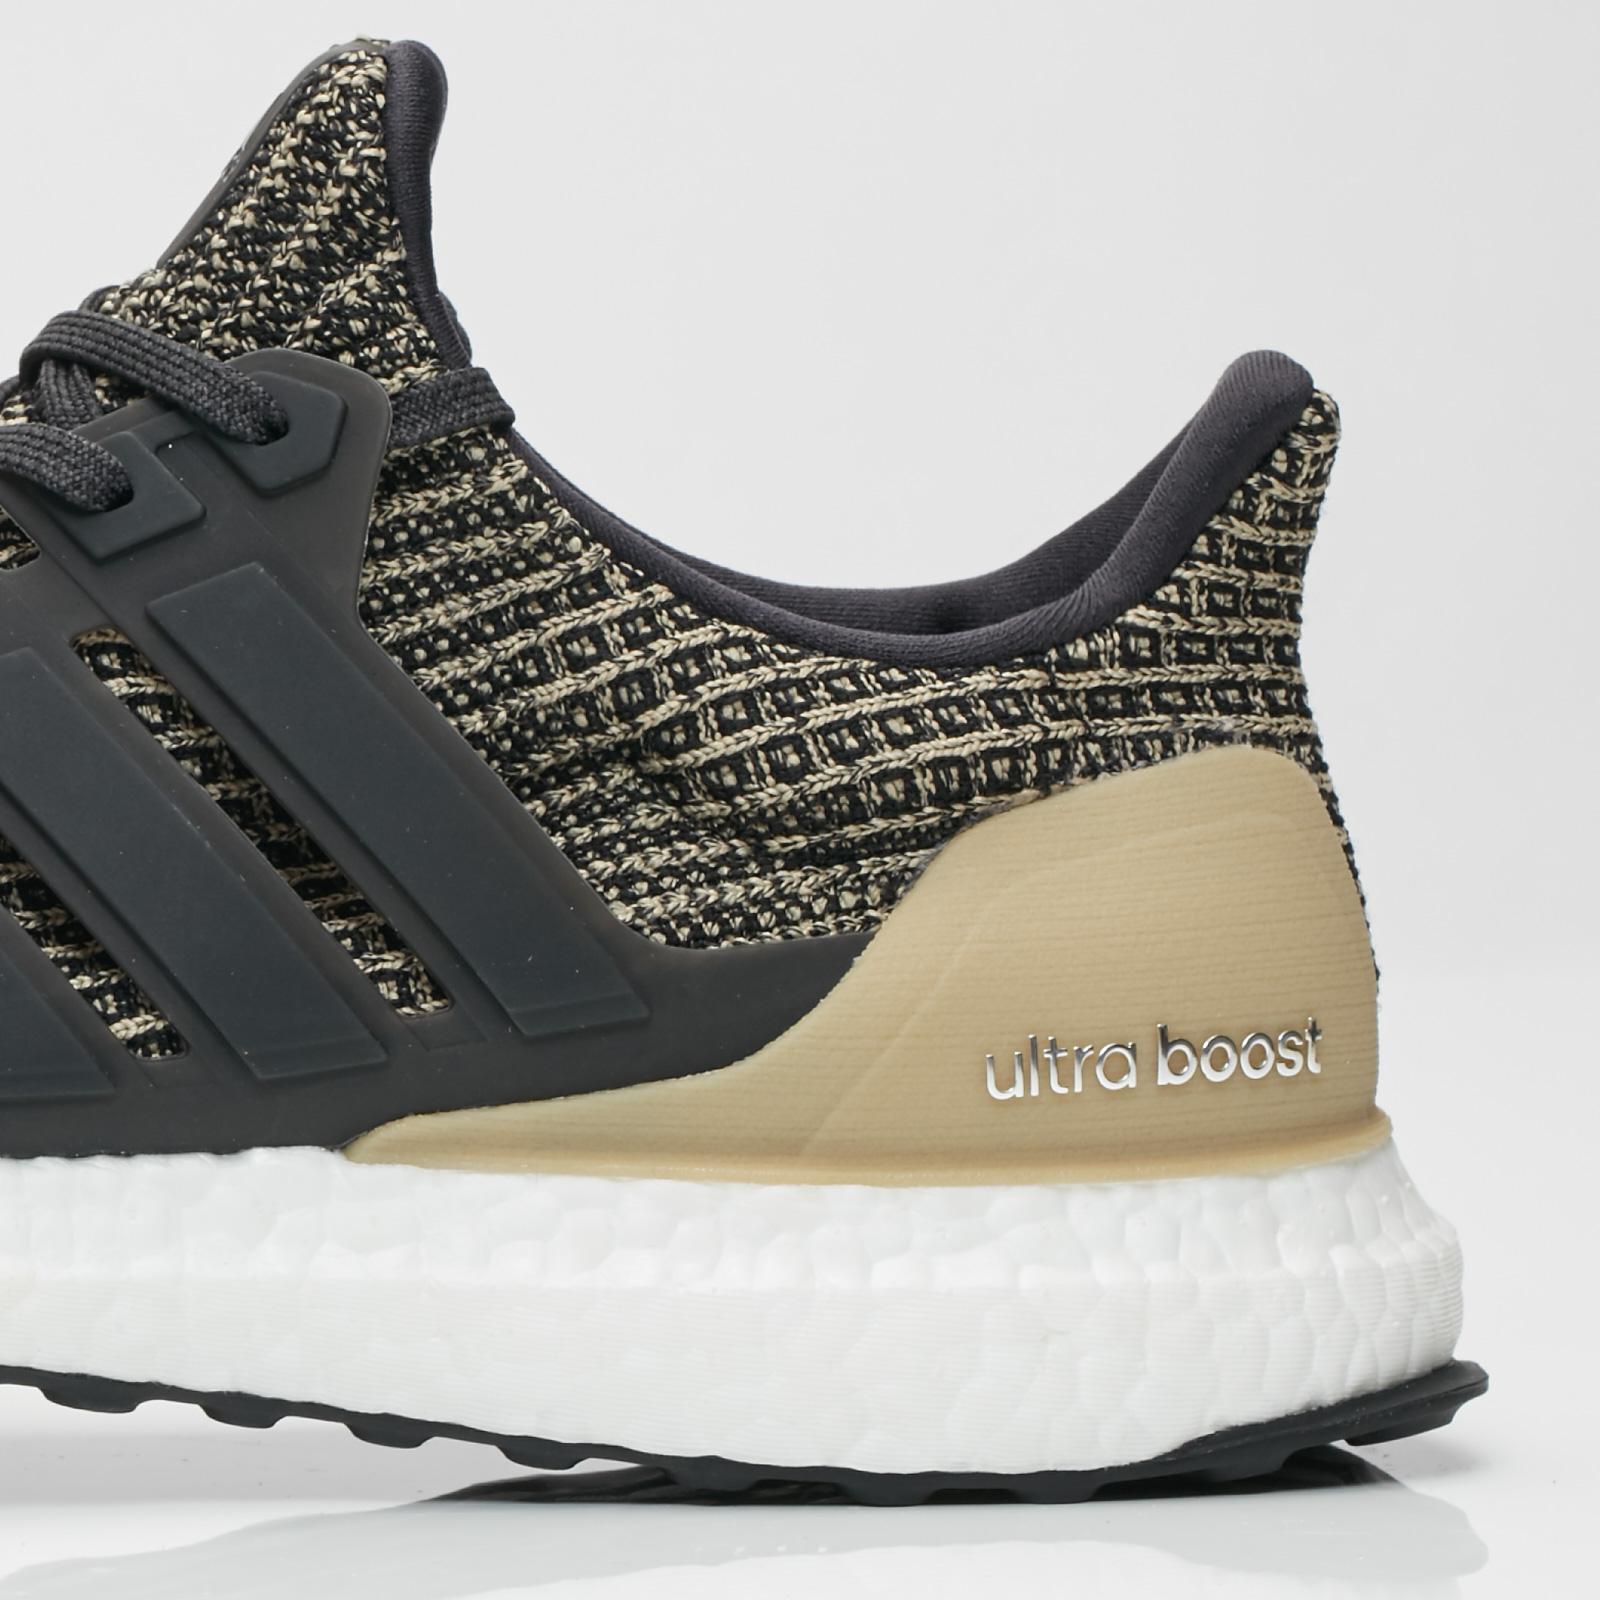 a497cf0128373 adidas UltraBOOST - Bb6170 - Sneakersnstuff